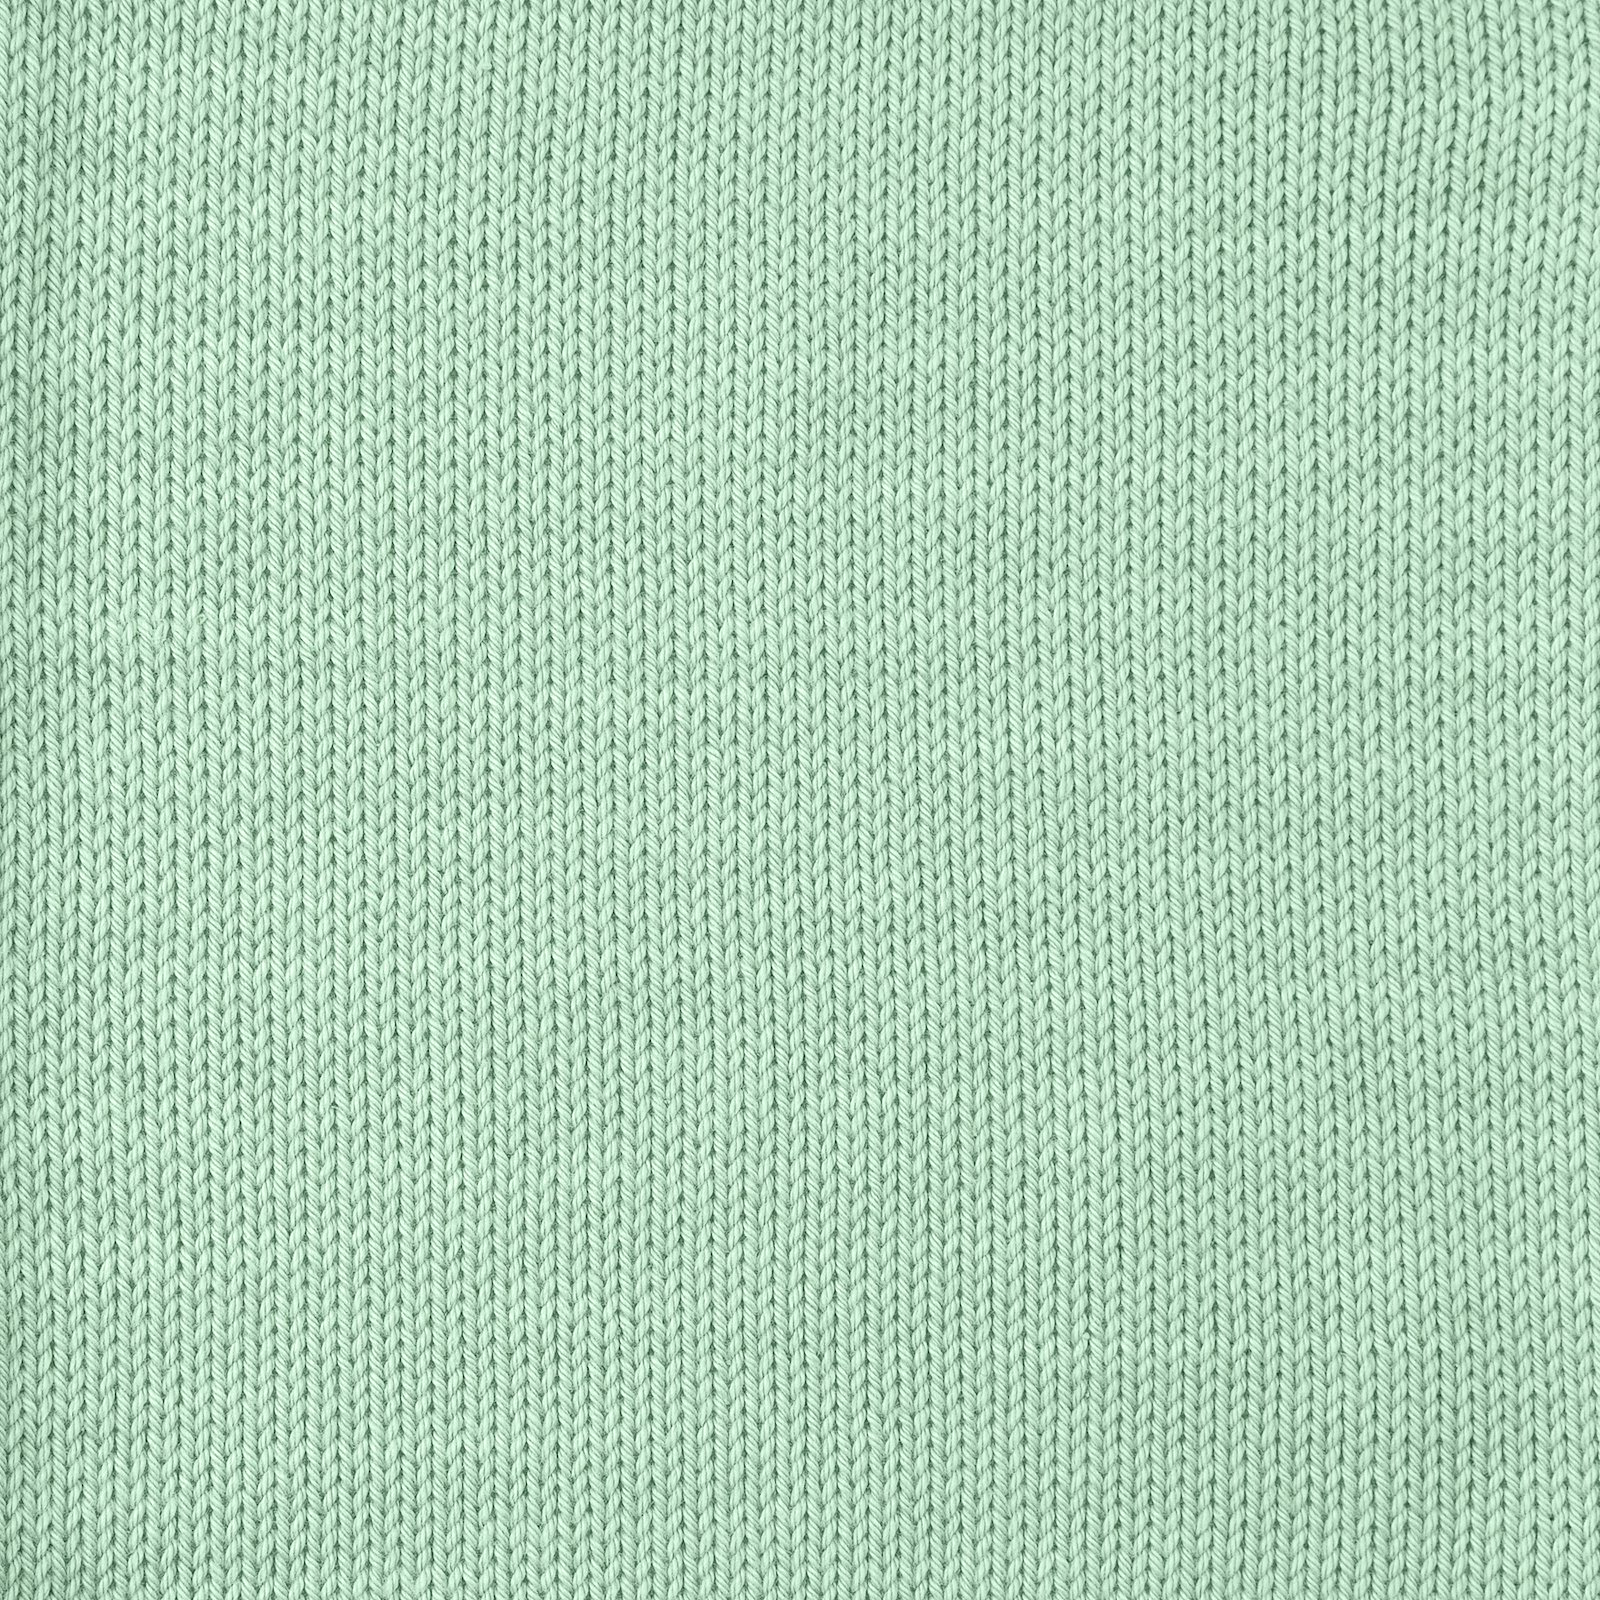 Colourful mint 50g 90060092_sskit